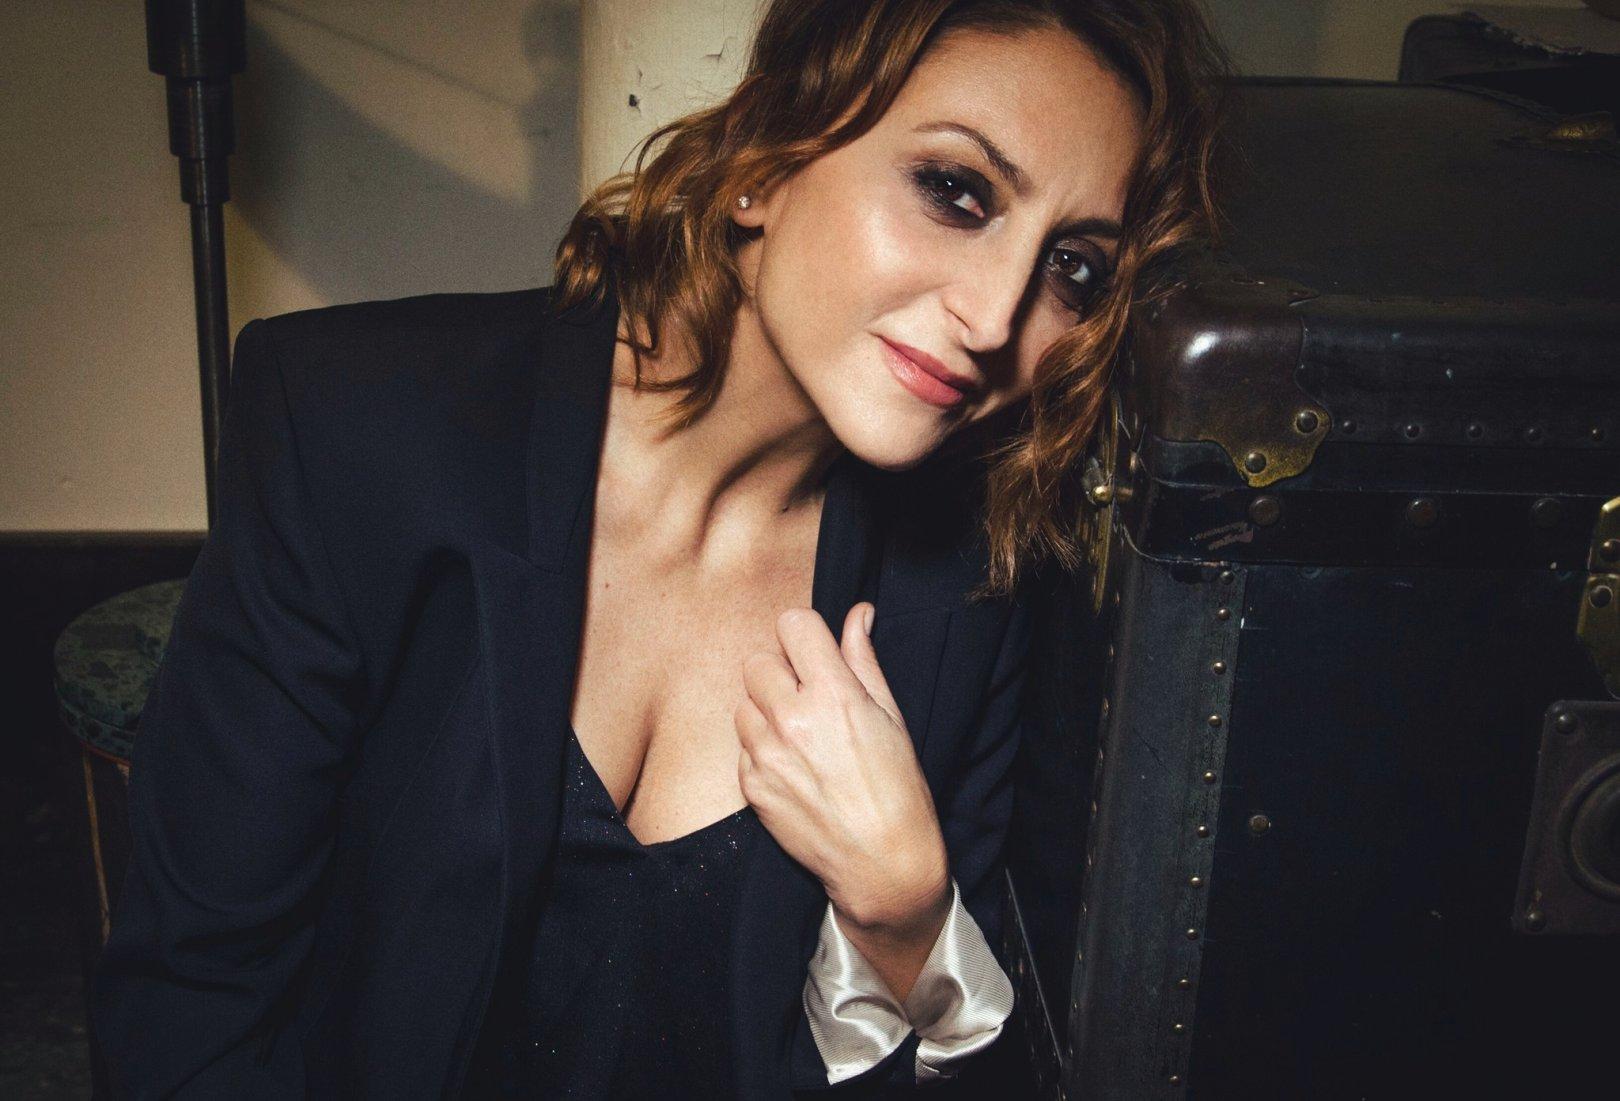 Paola Minaccioni